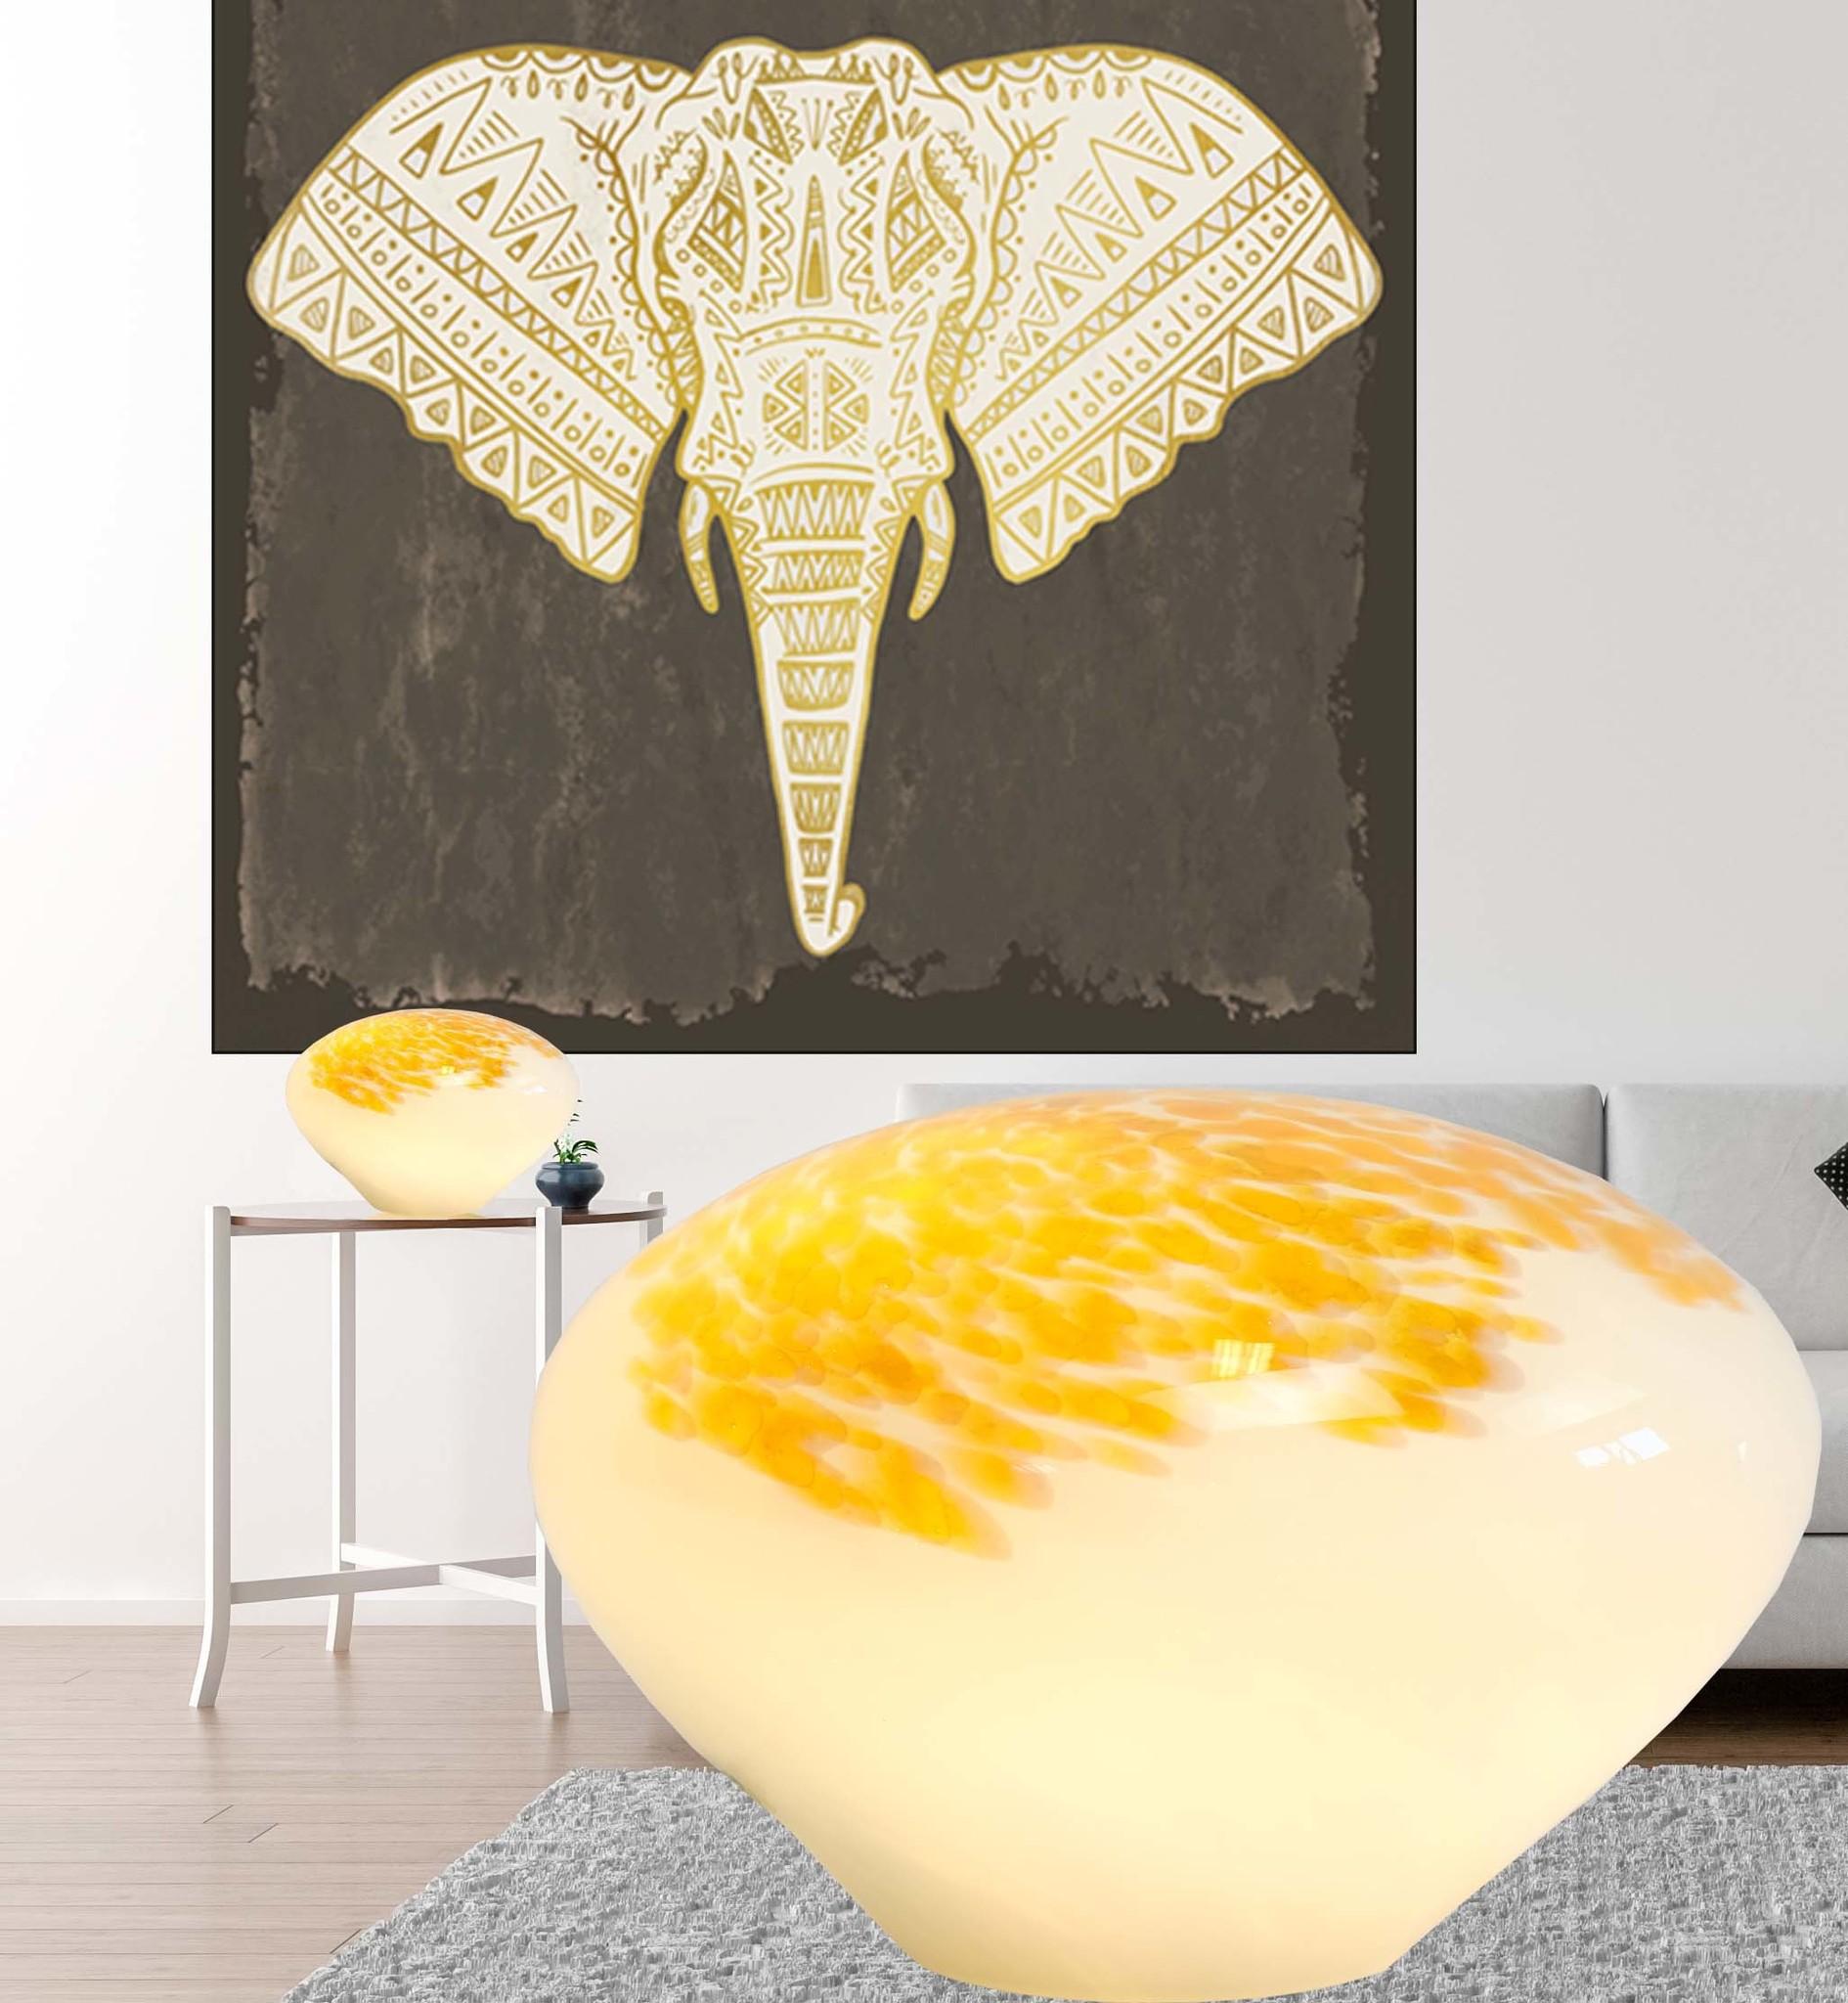 Handgemaakte lamp van kristal